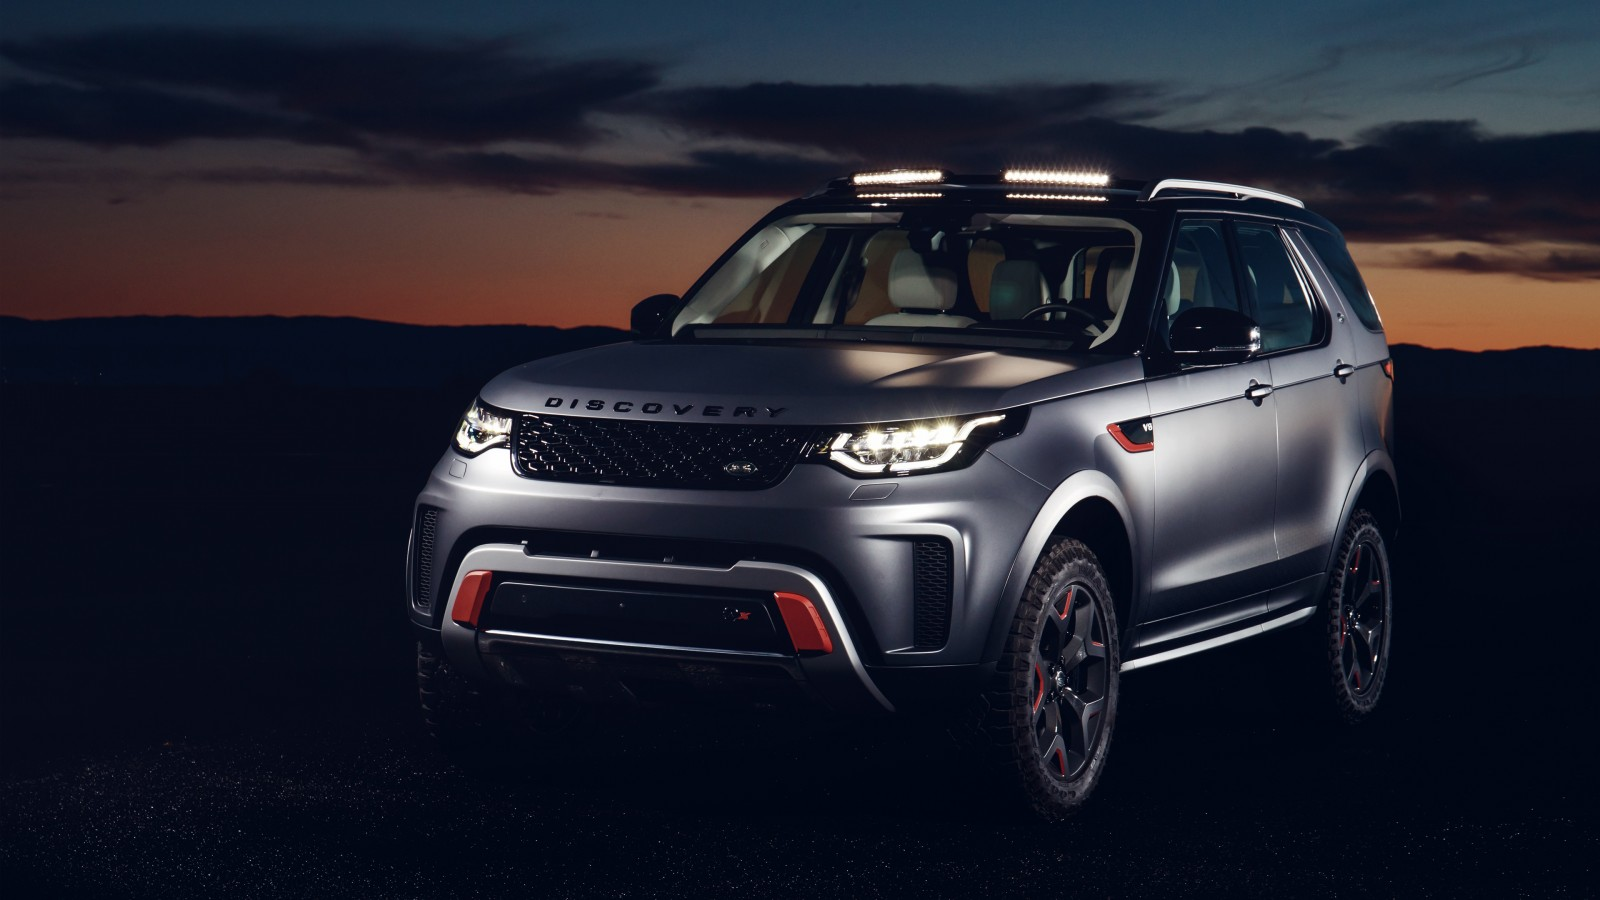 James Bond Iphone Wallpaper 2018 Land Rover Discovery Svx 4k Wallpapers Hd